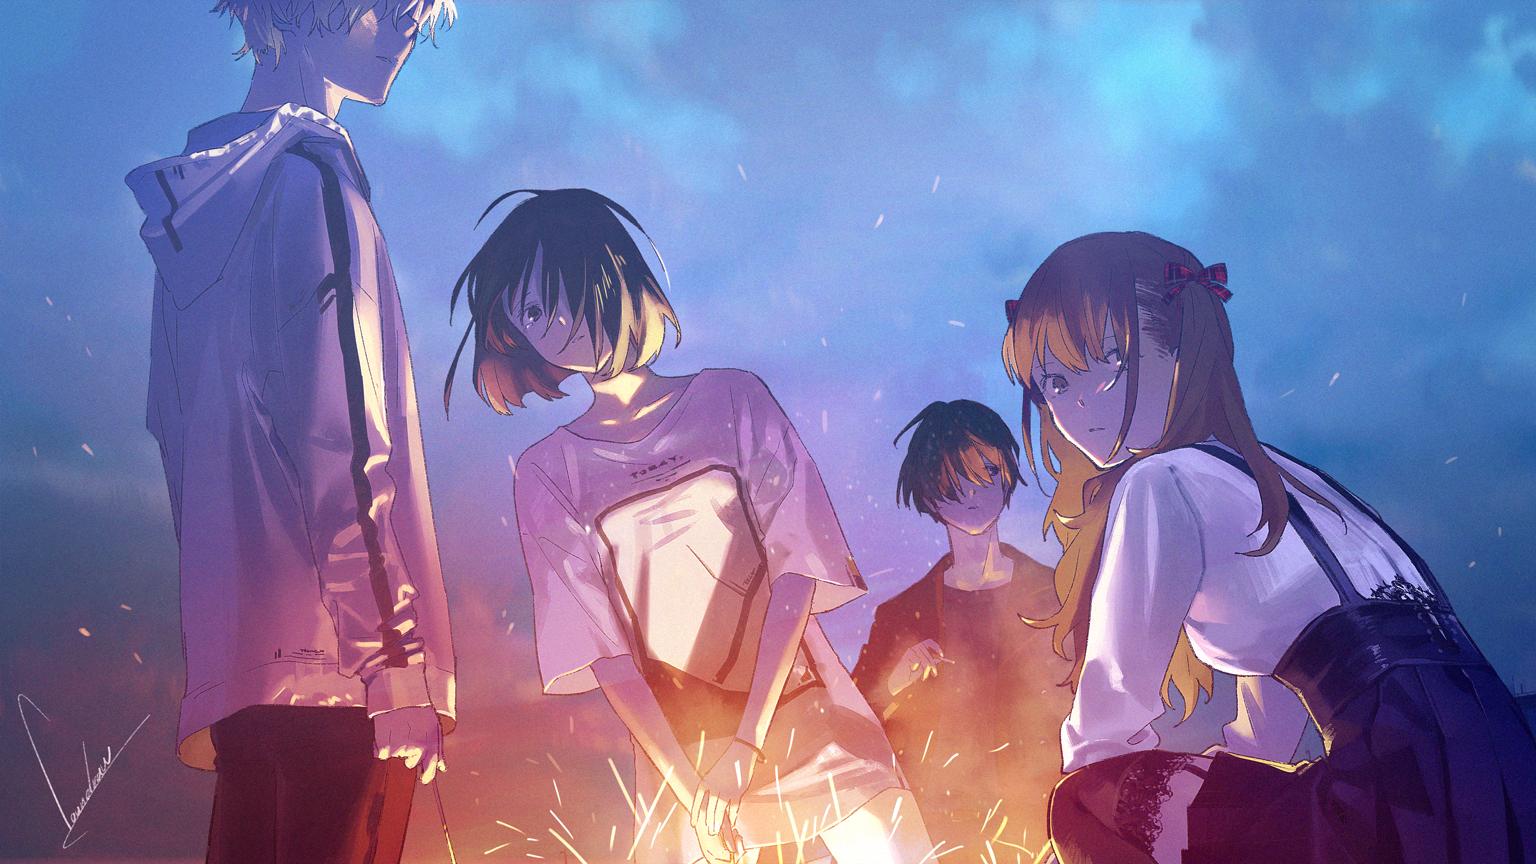 loundraw初监督作品,短篇动画电影「Summer Ghost」将于2021年上映